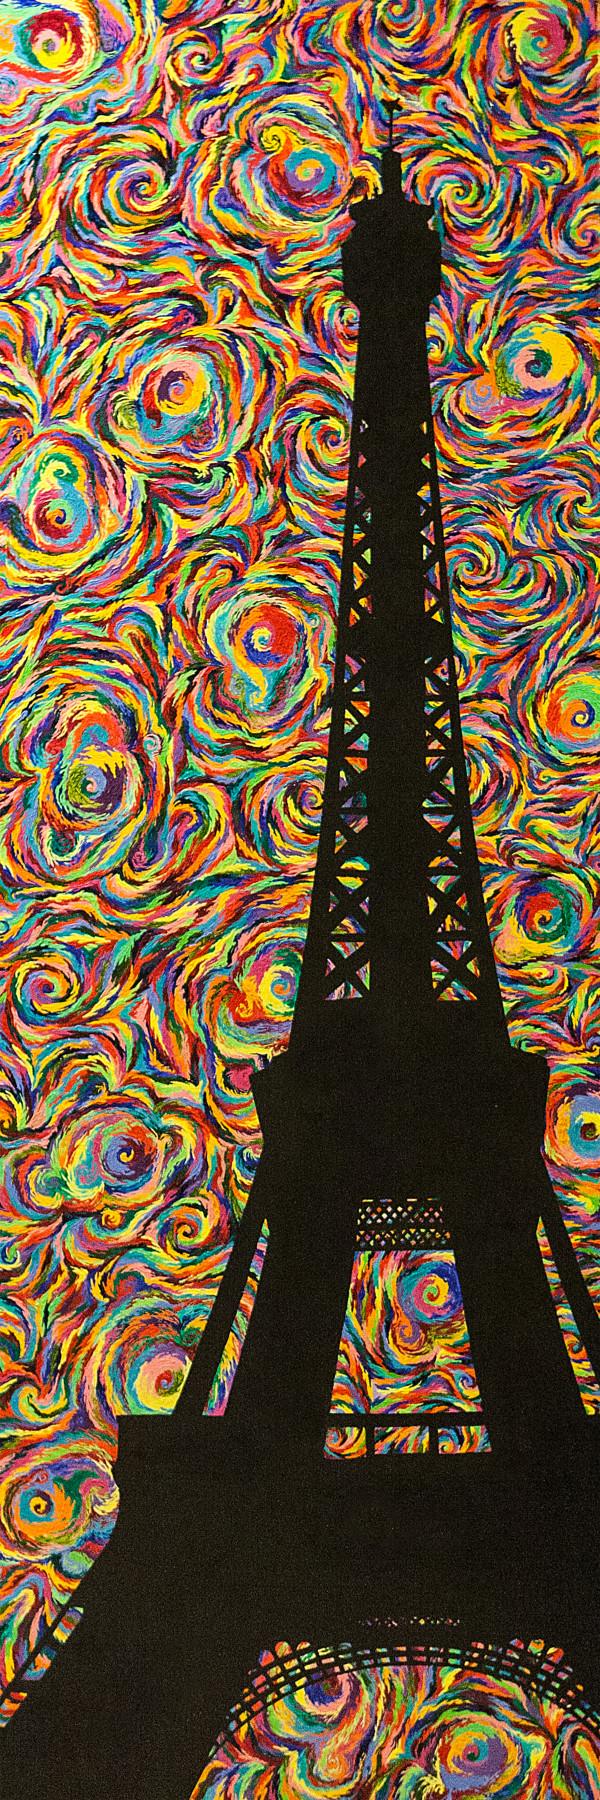 Spirit of Paris by Sean Christopher Ward